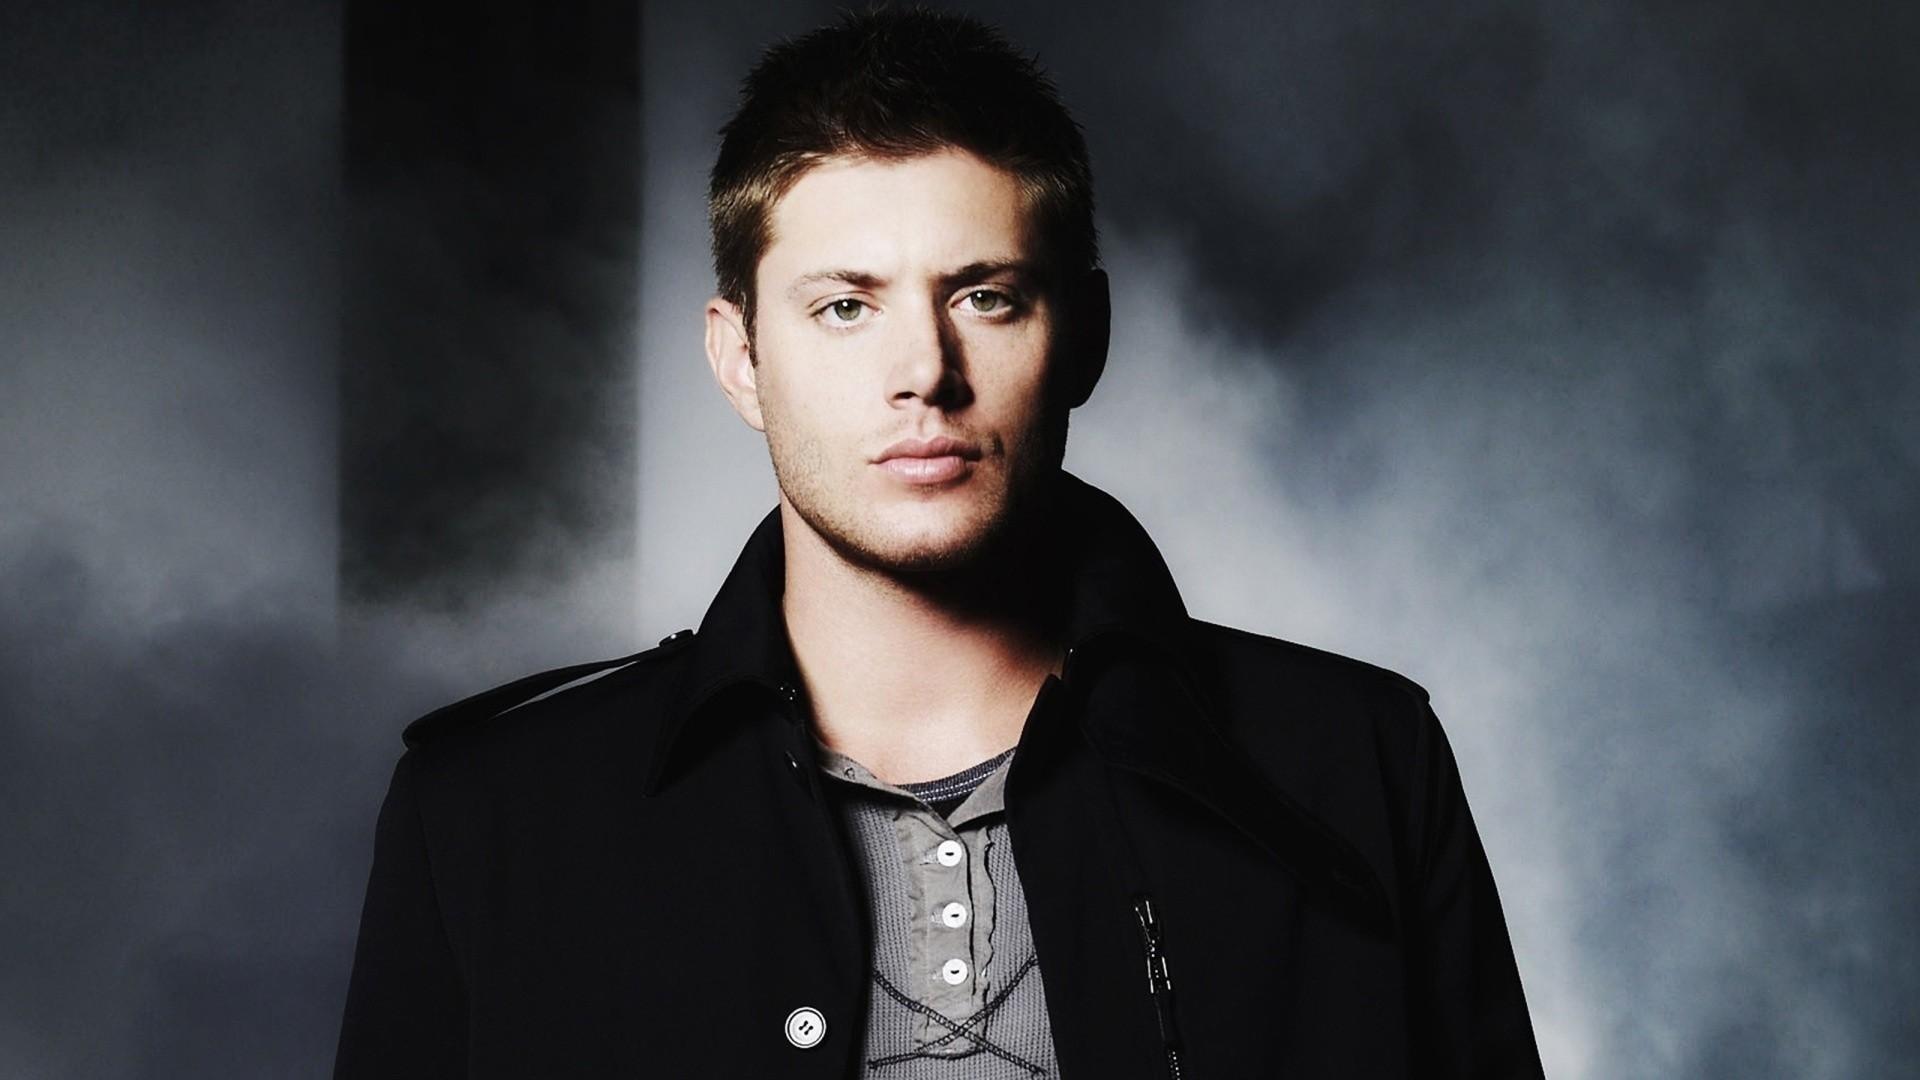 <b>Supernatural</b> Phone <b>Wallpaper</b